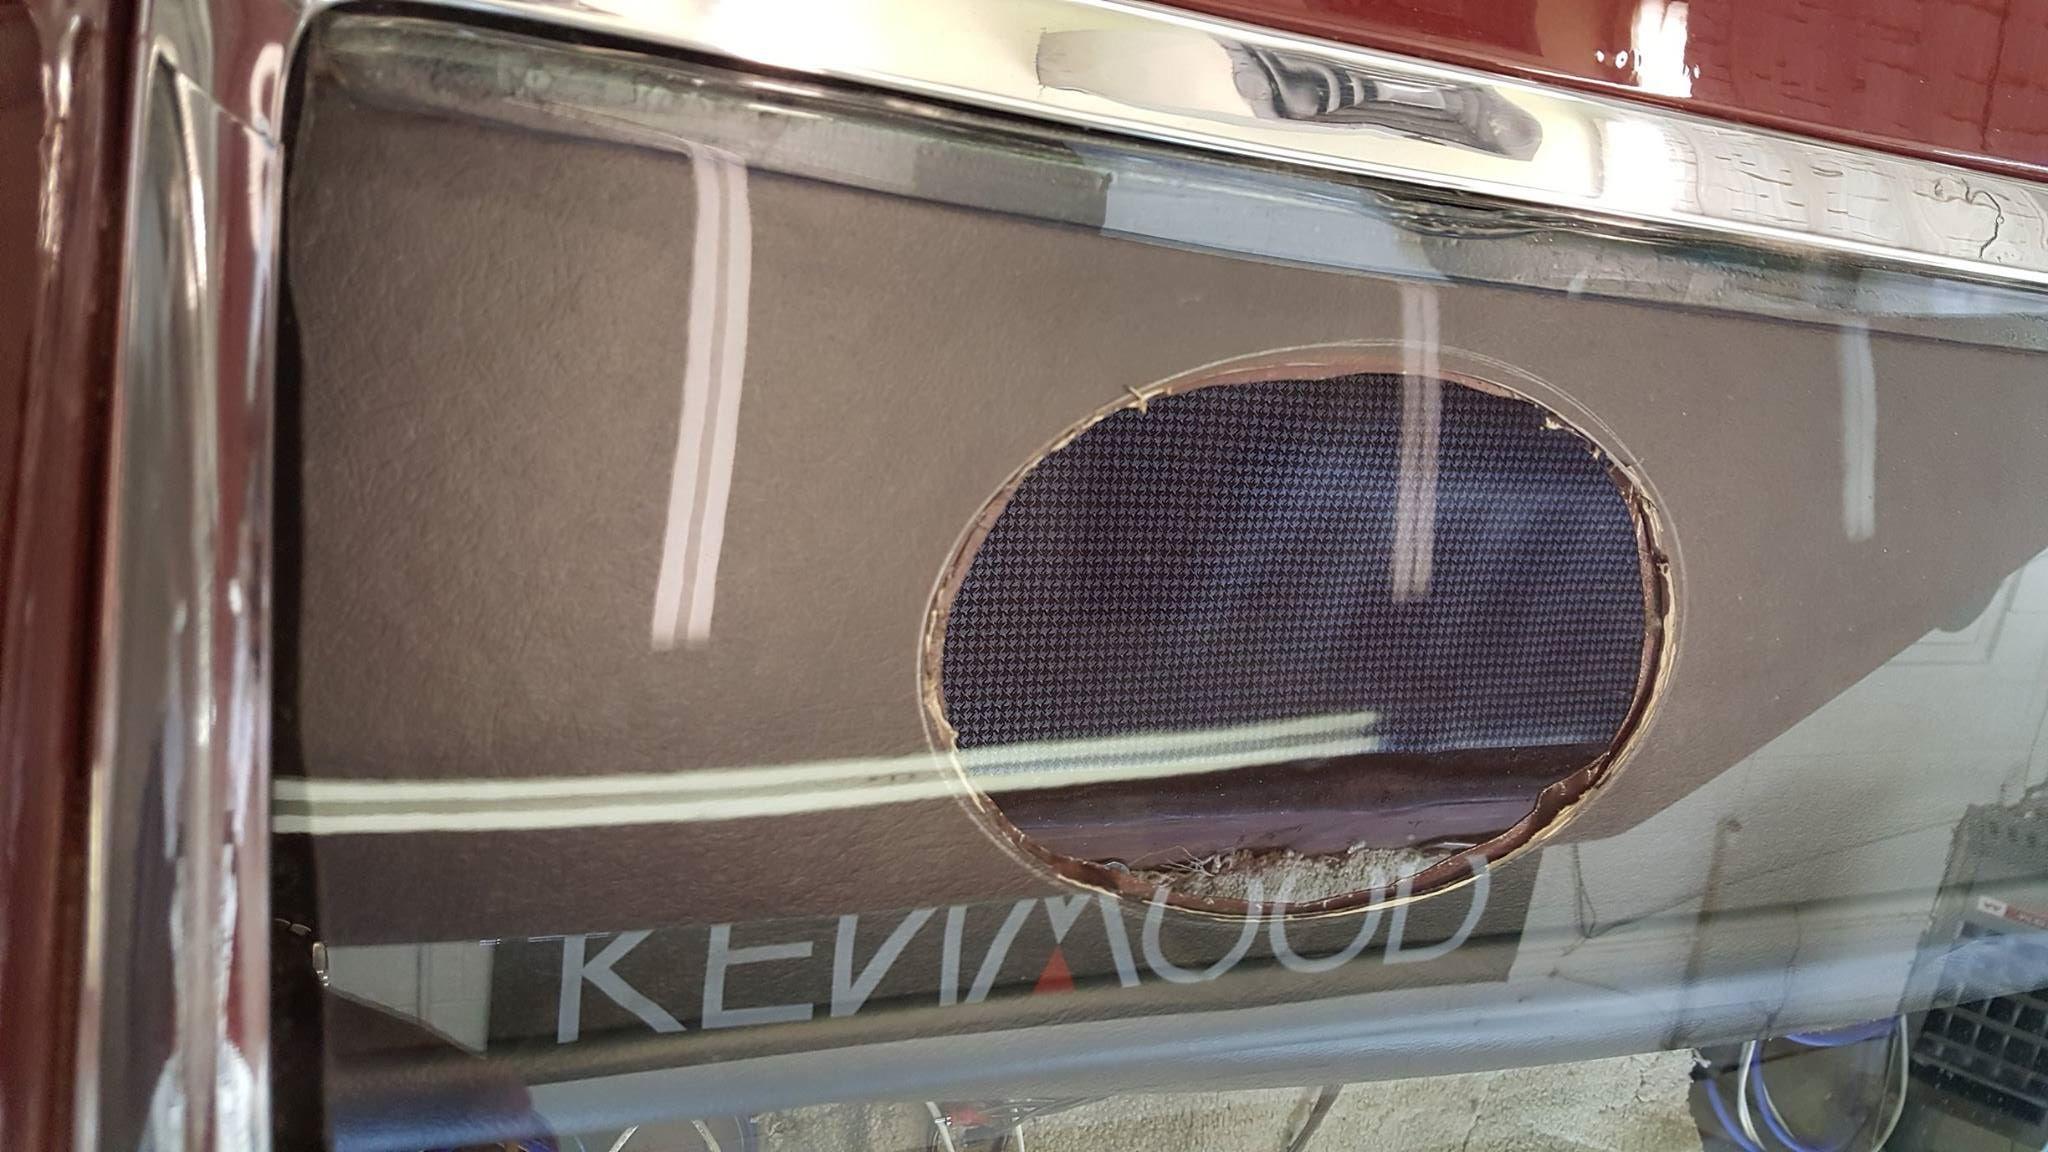 1966 Pontiac sound system installation